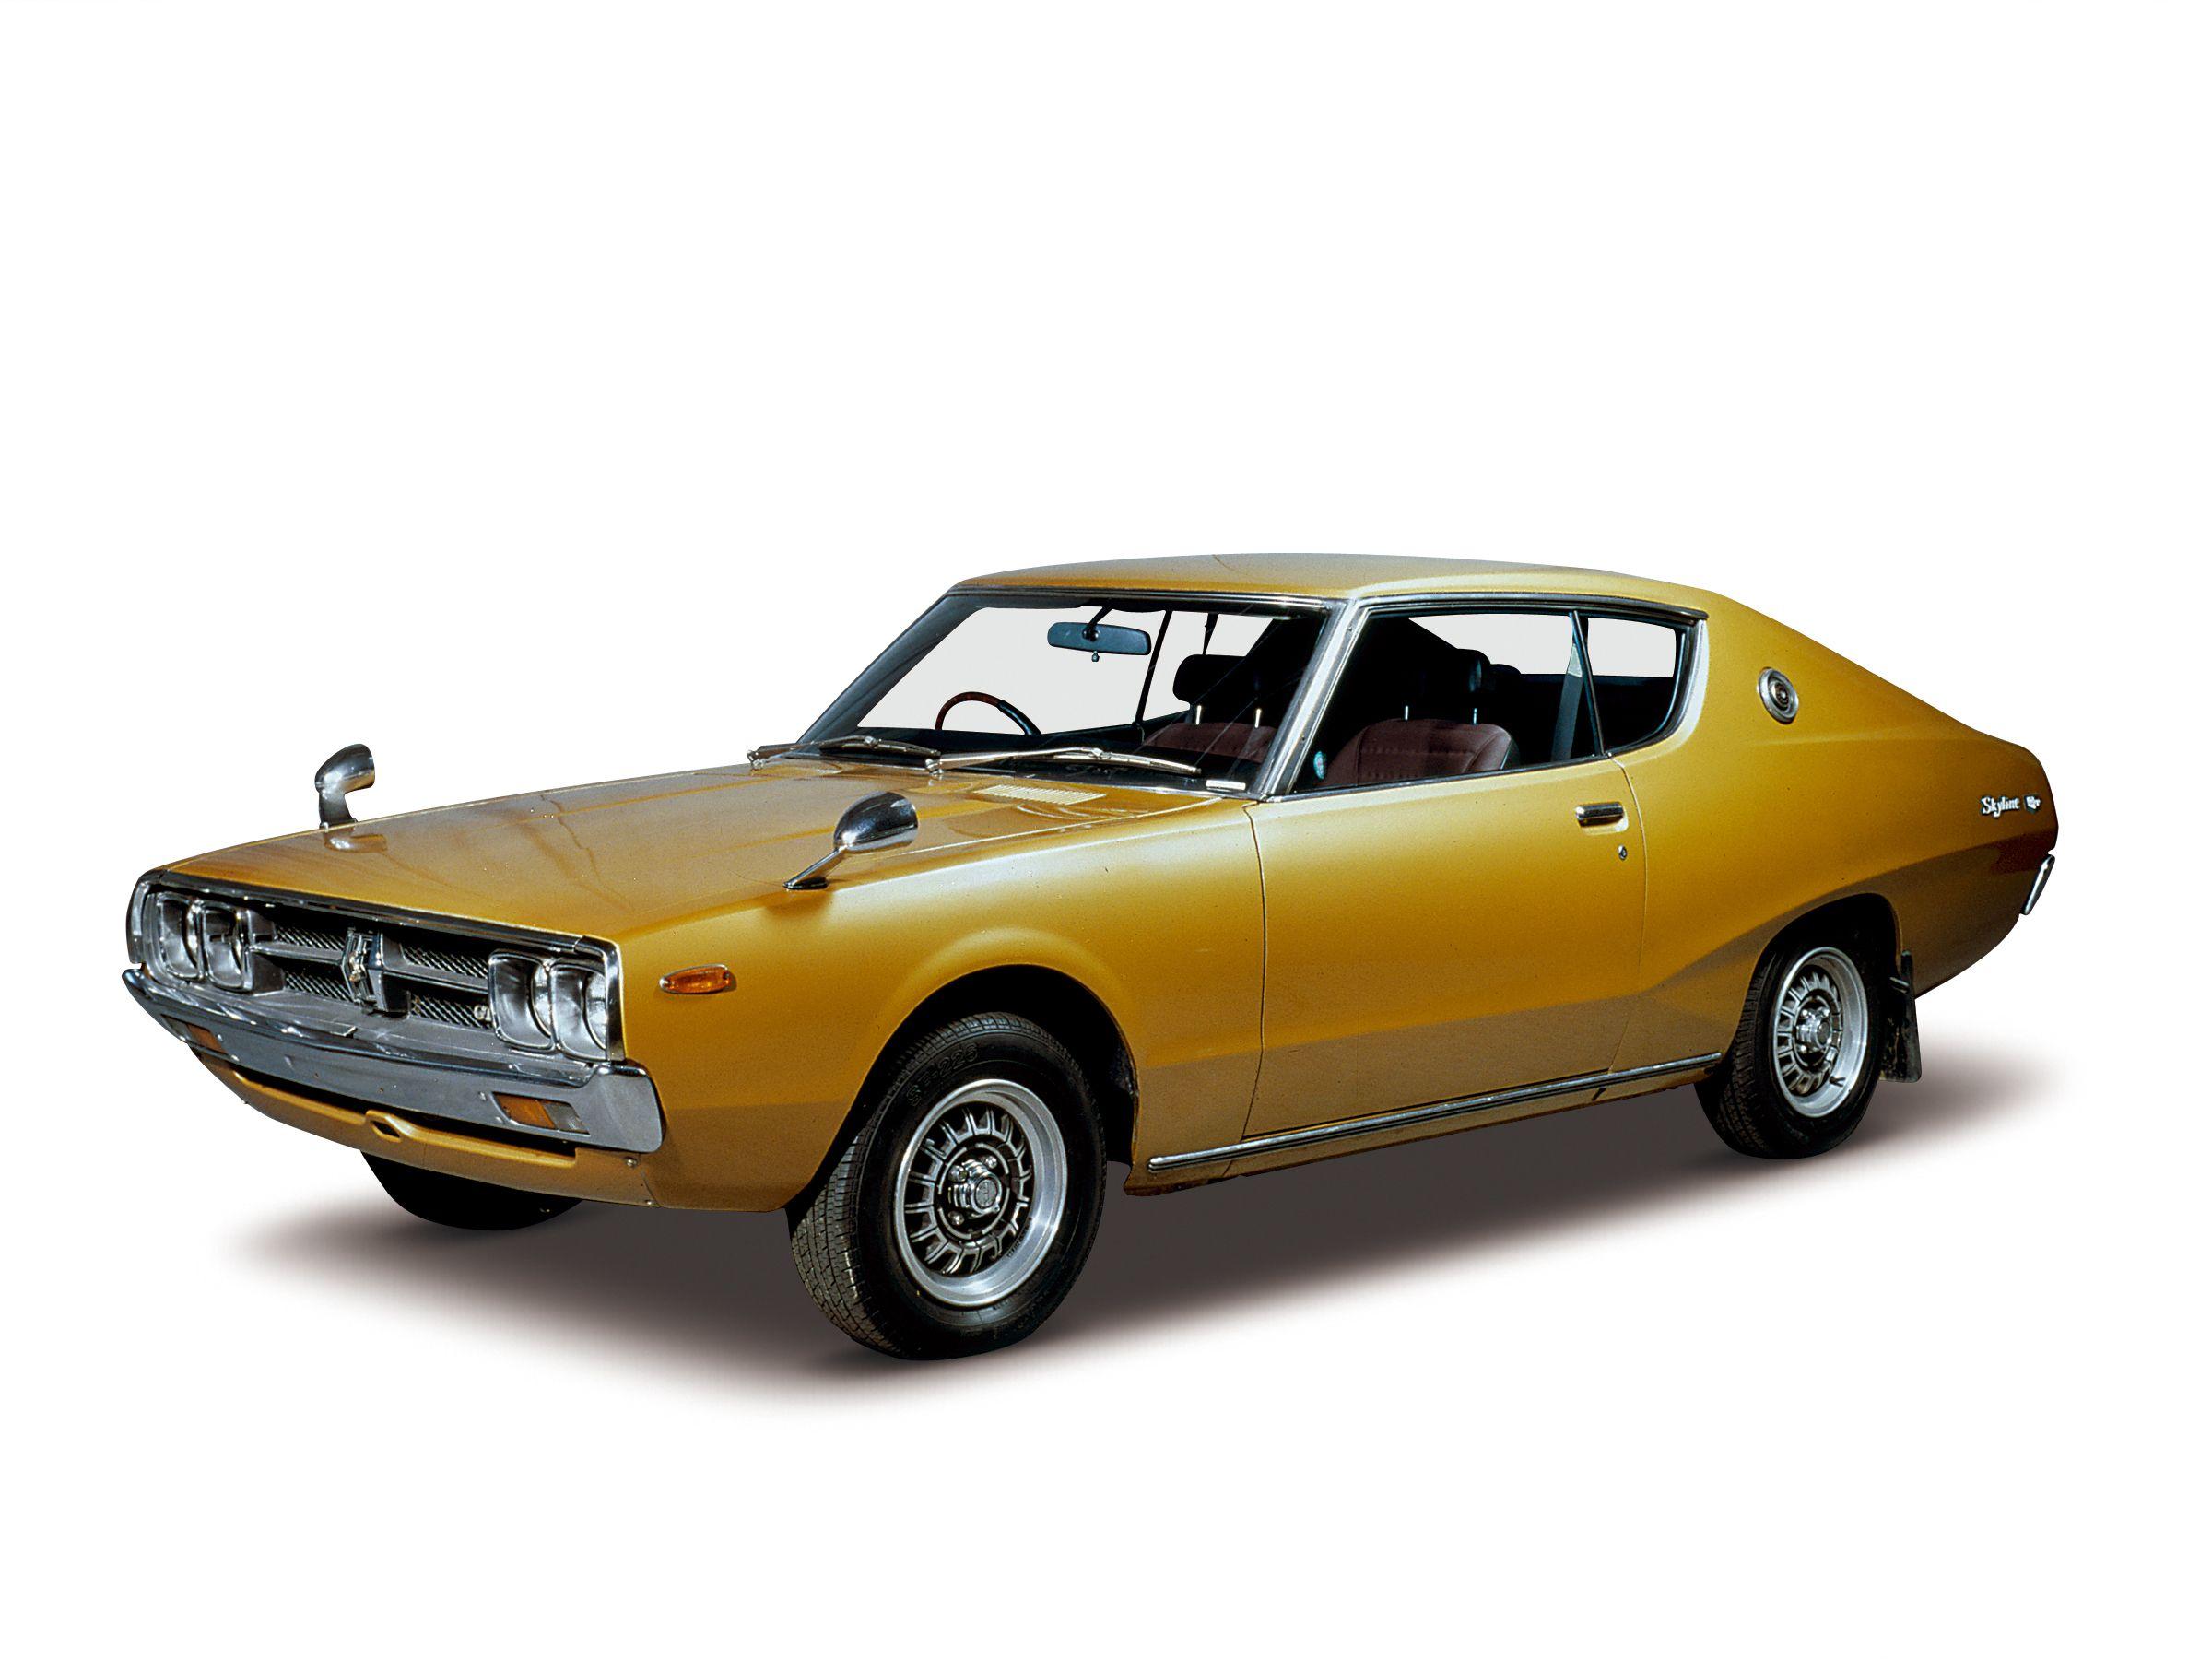 Index of /manual/C110 Skyline/Nissan Skyline (C110) 1972-1977/